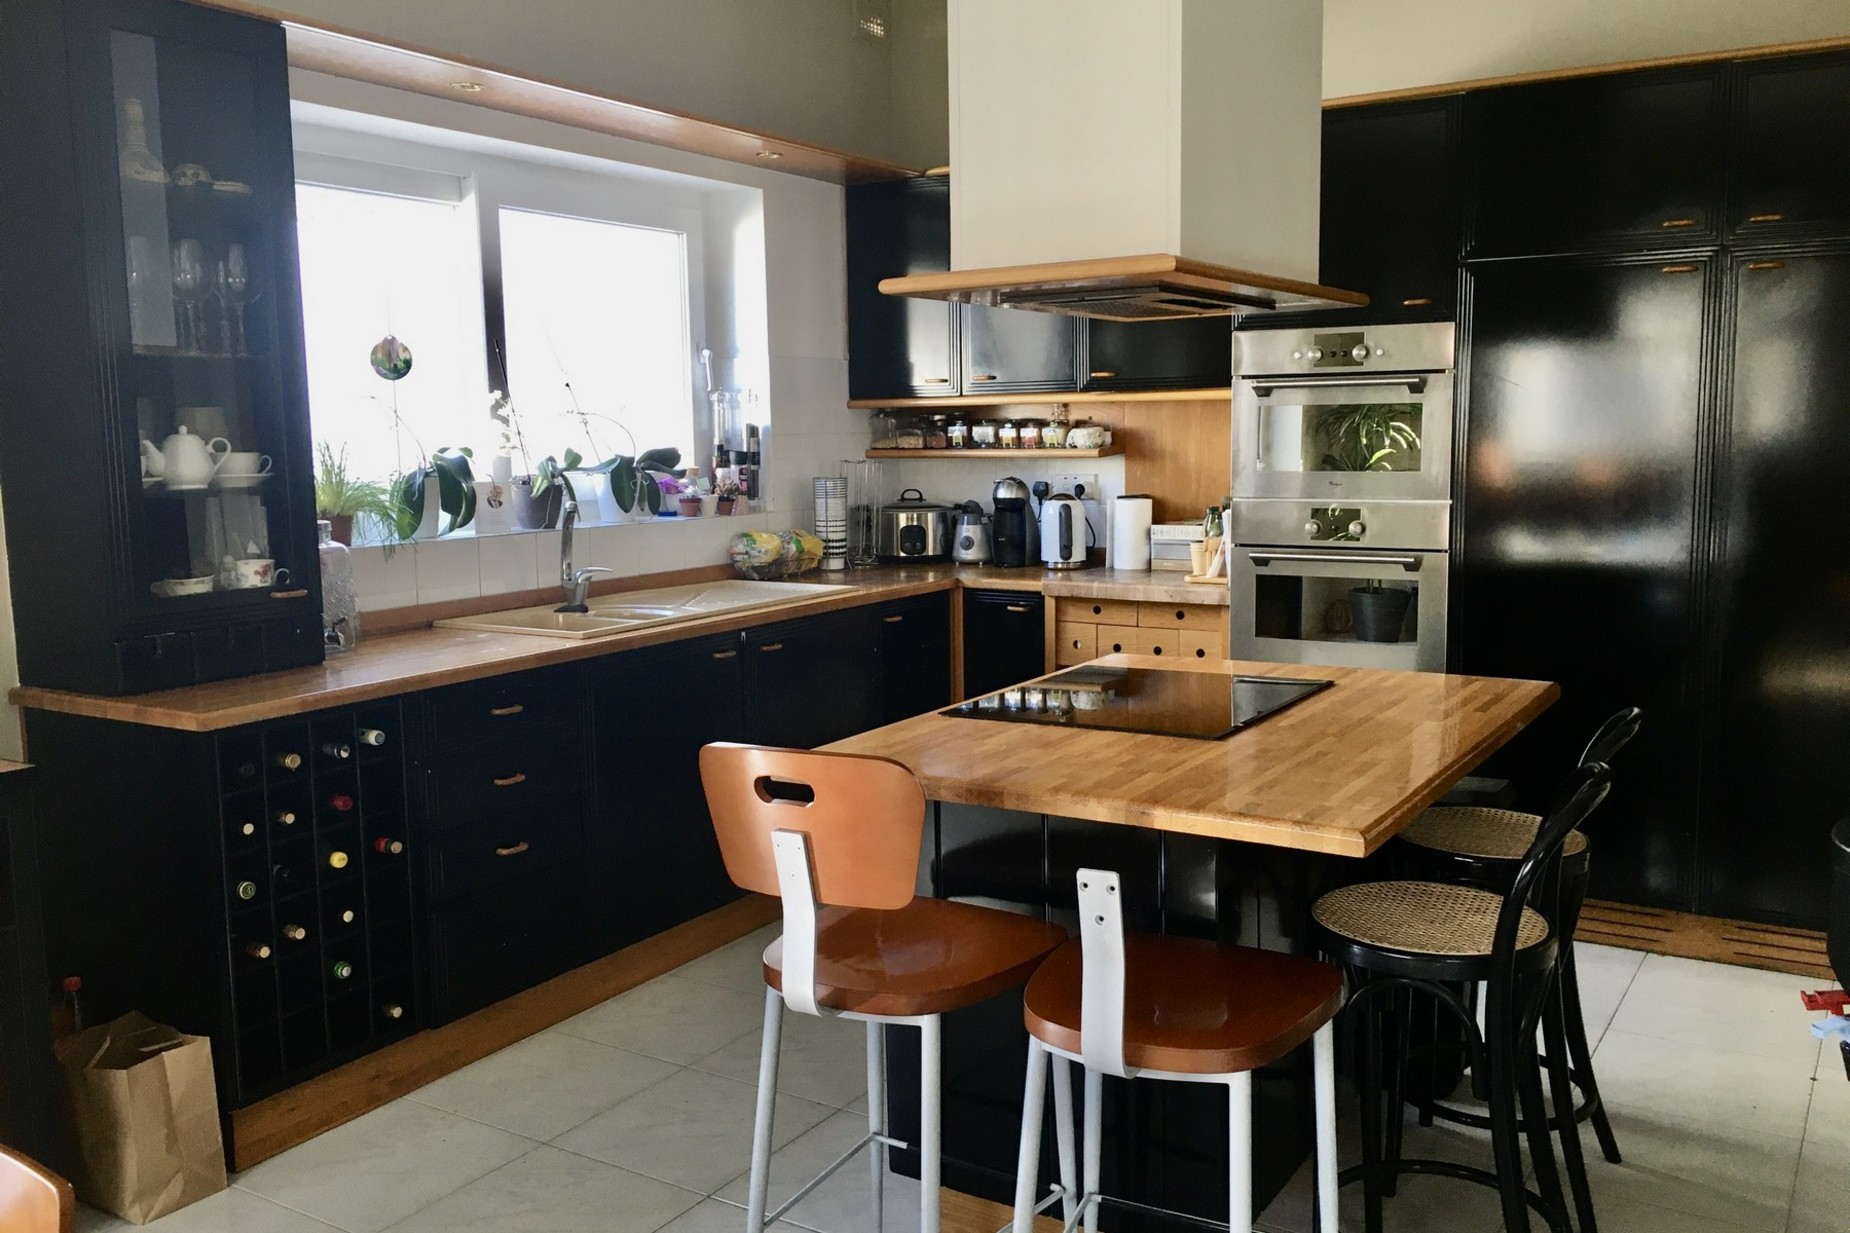 3 bed Villa For Sale in Pembroke, Pembroke - thumb 4